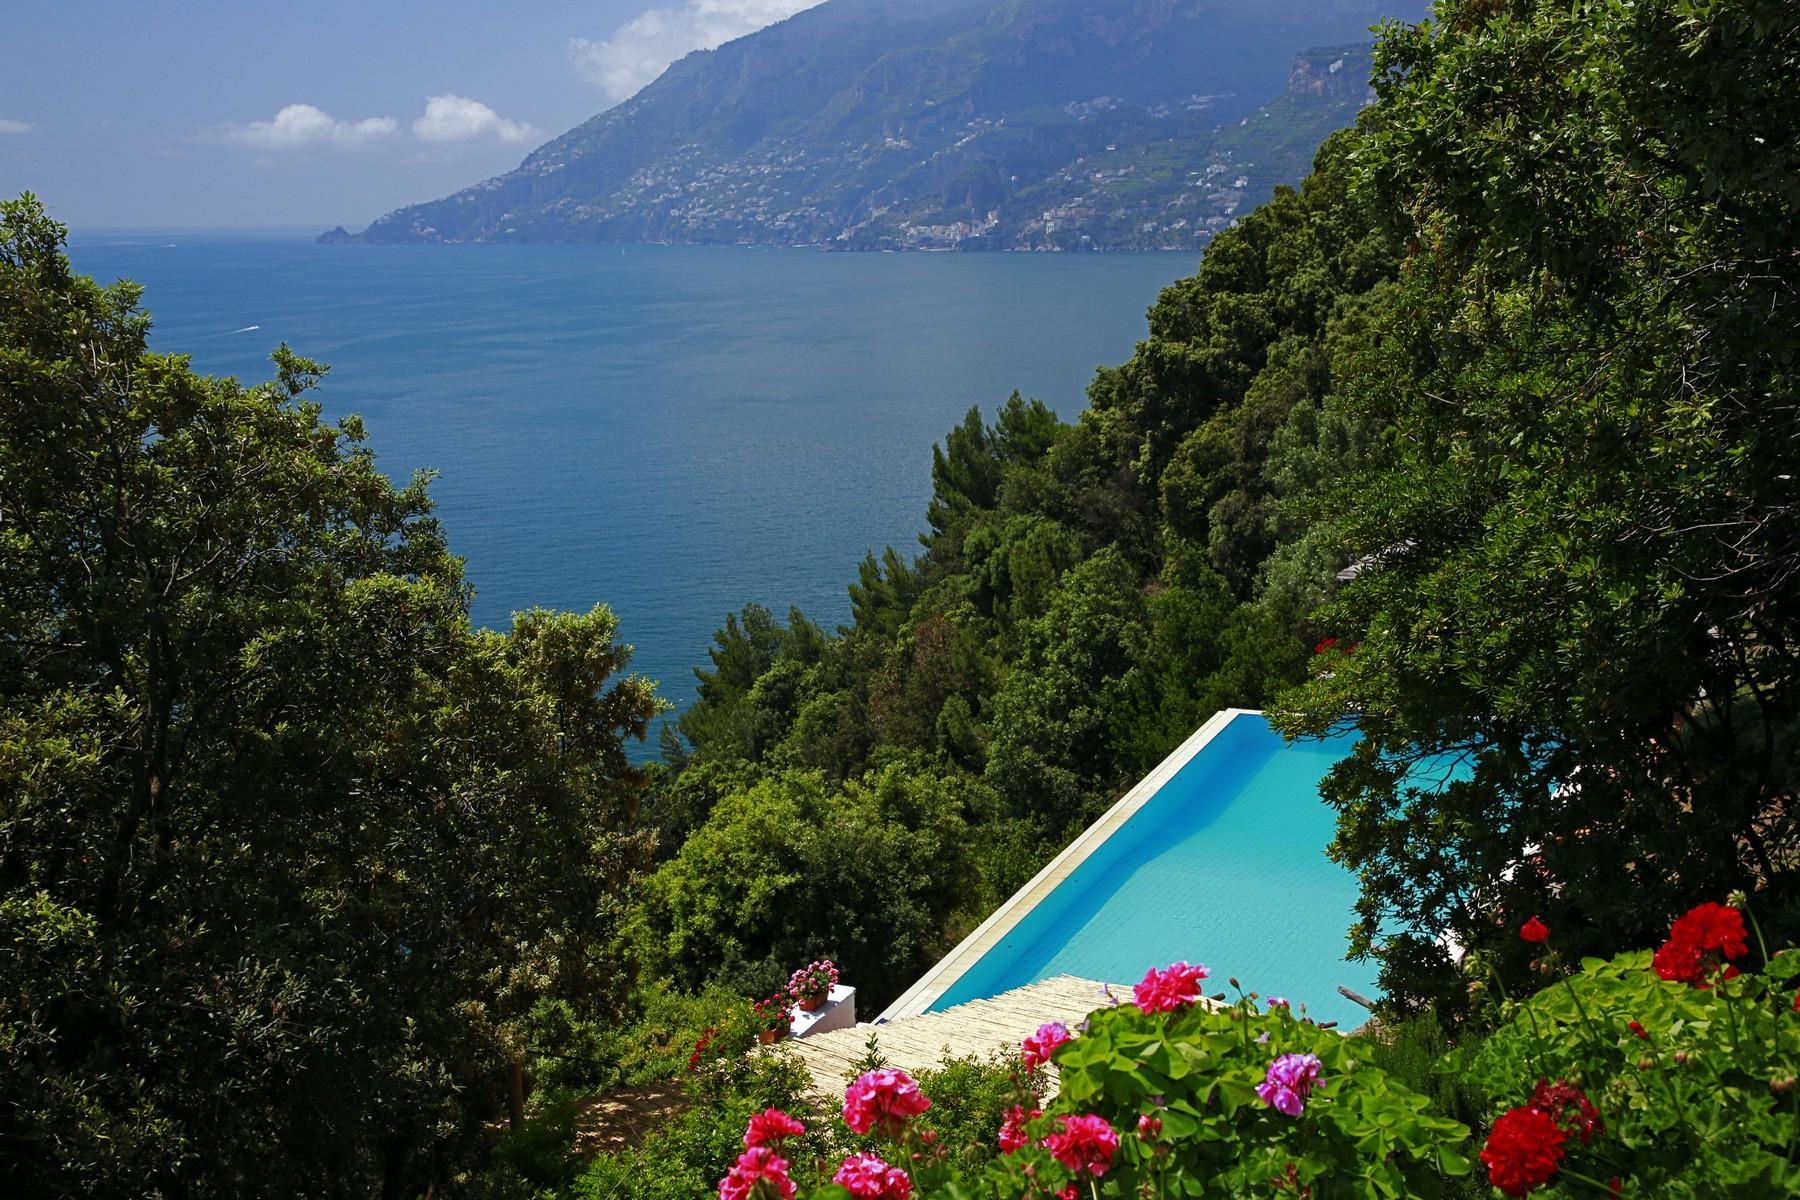 现代式别墅近Amalfitana海岸 - 2